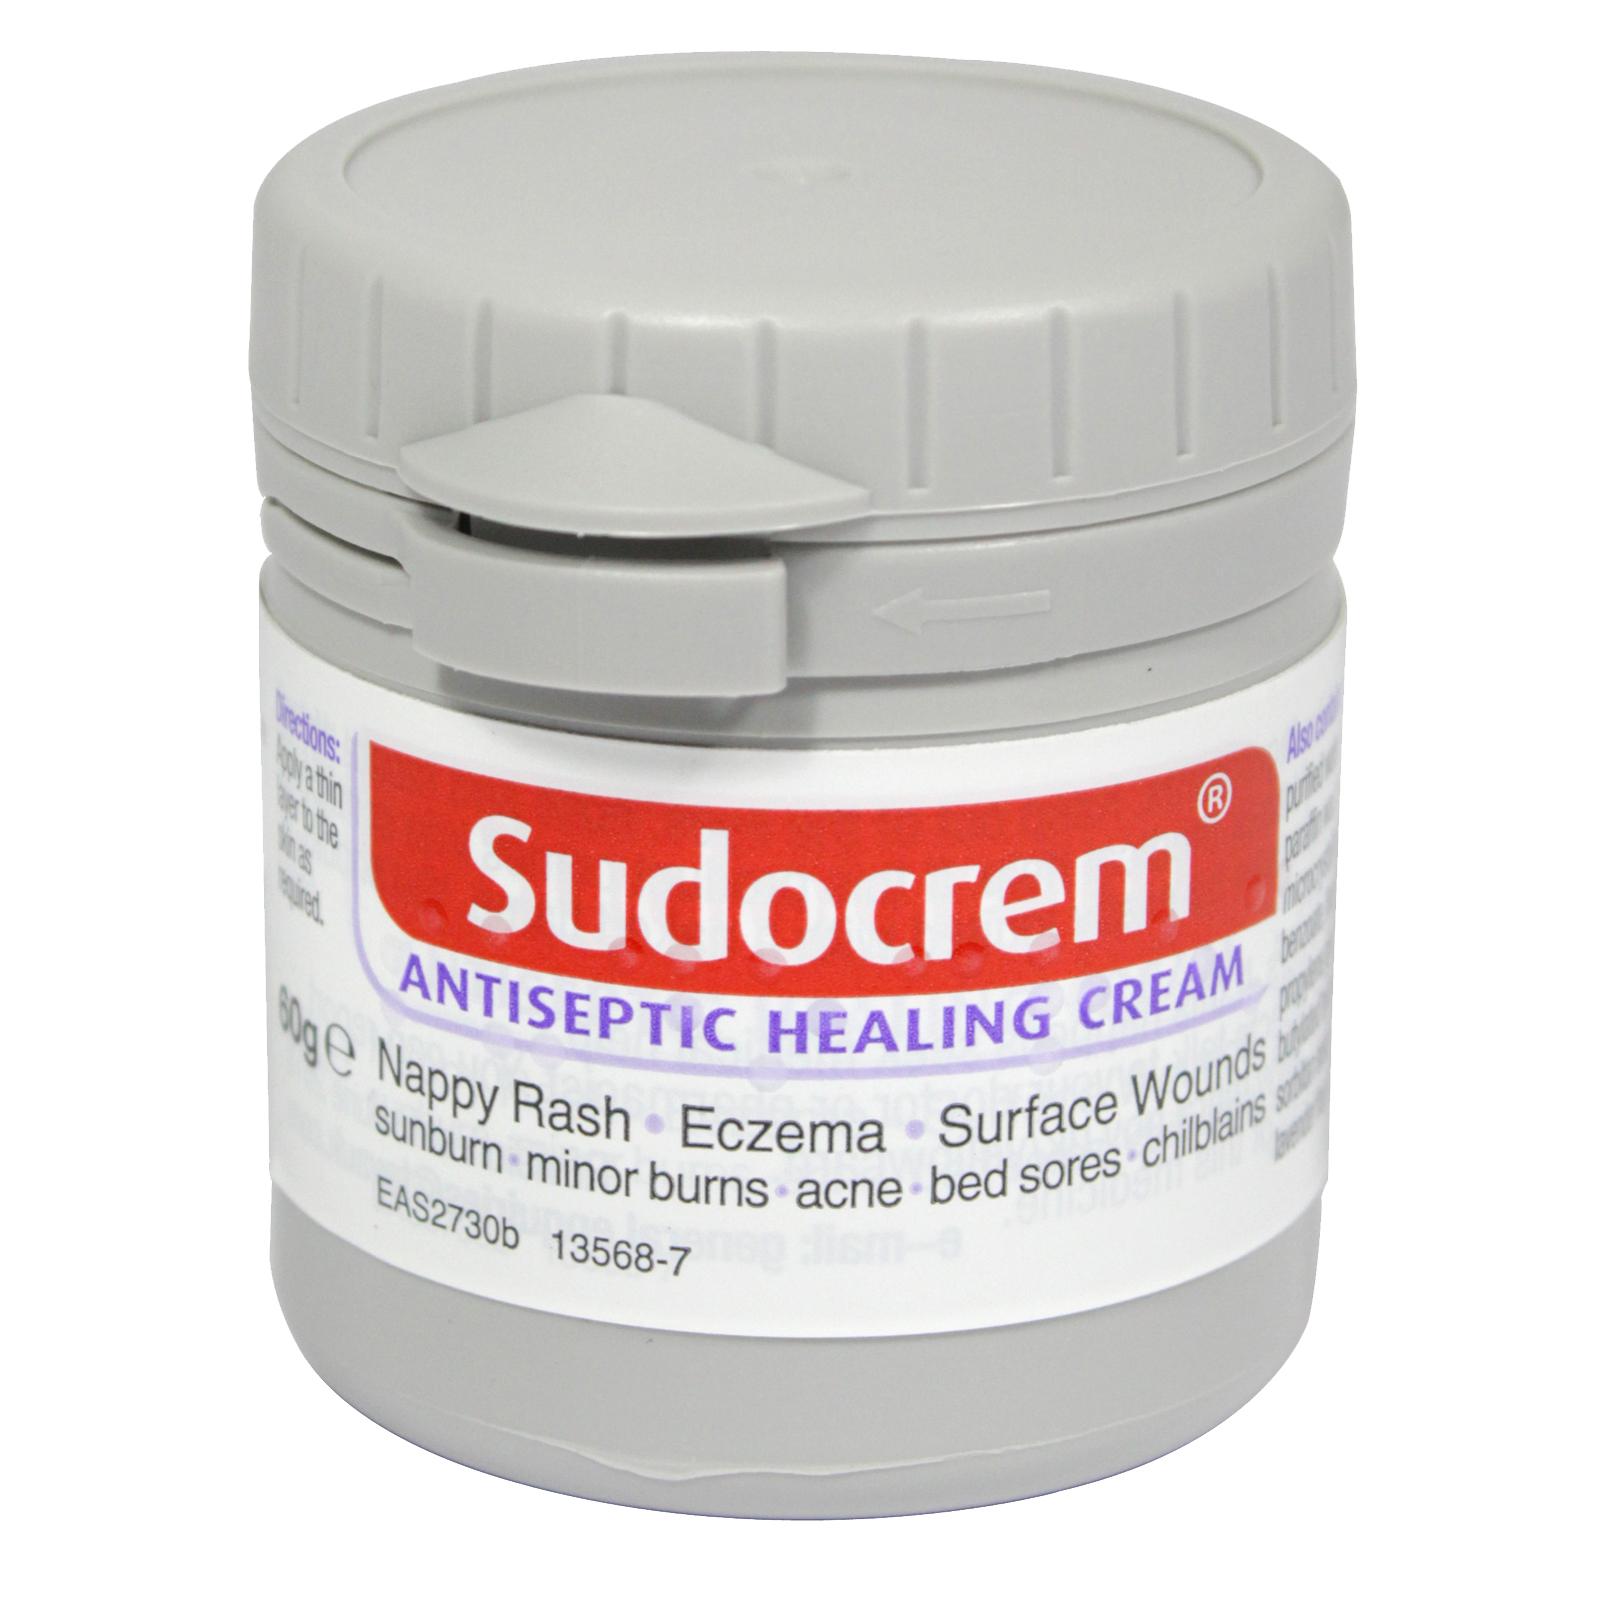 SUDOCREM 60G ANTISEPTIC TUB (NON RETURNABLE)